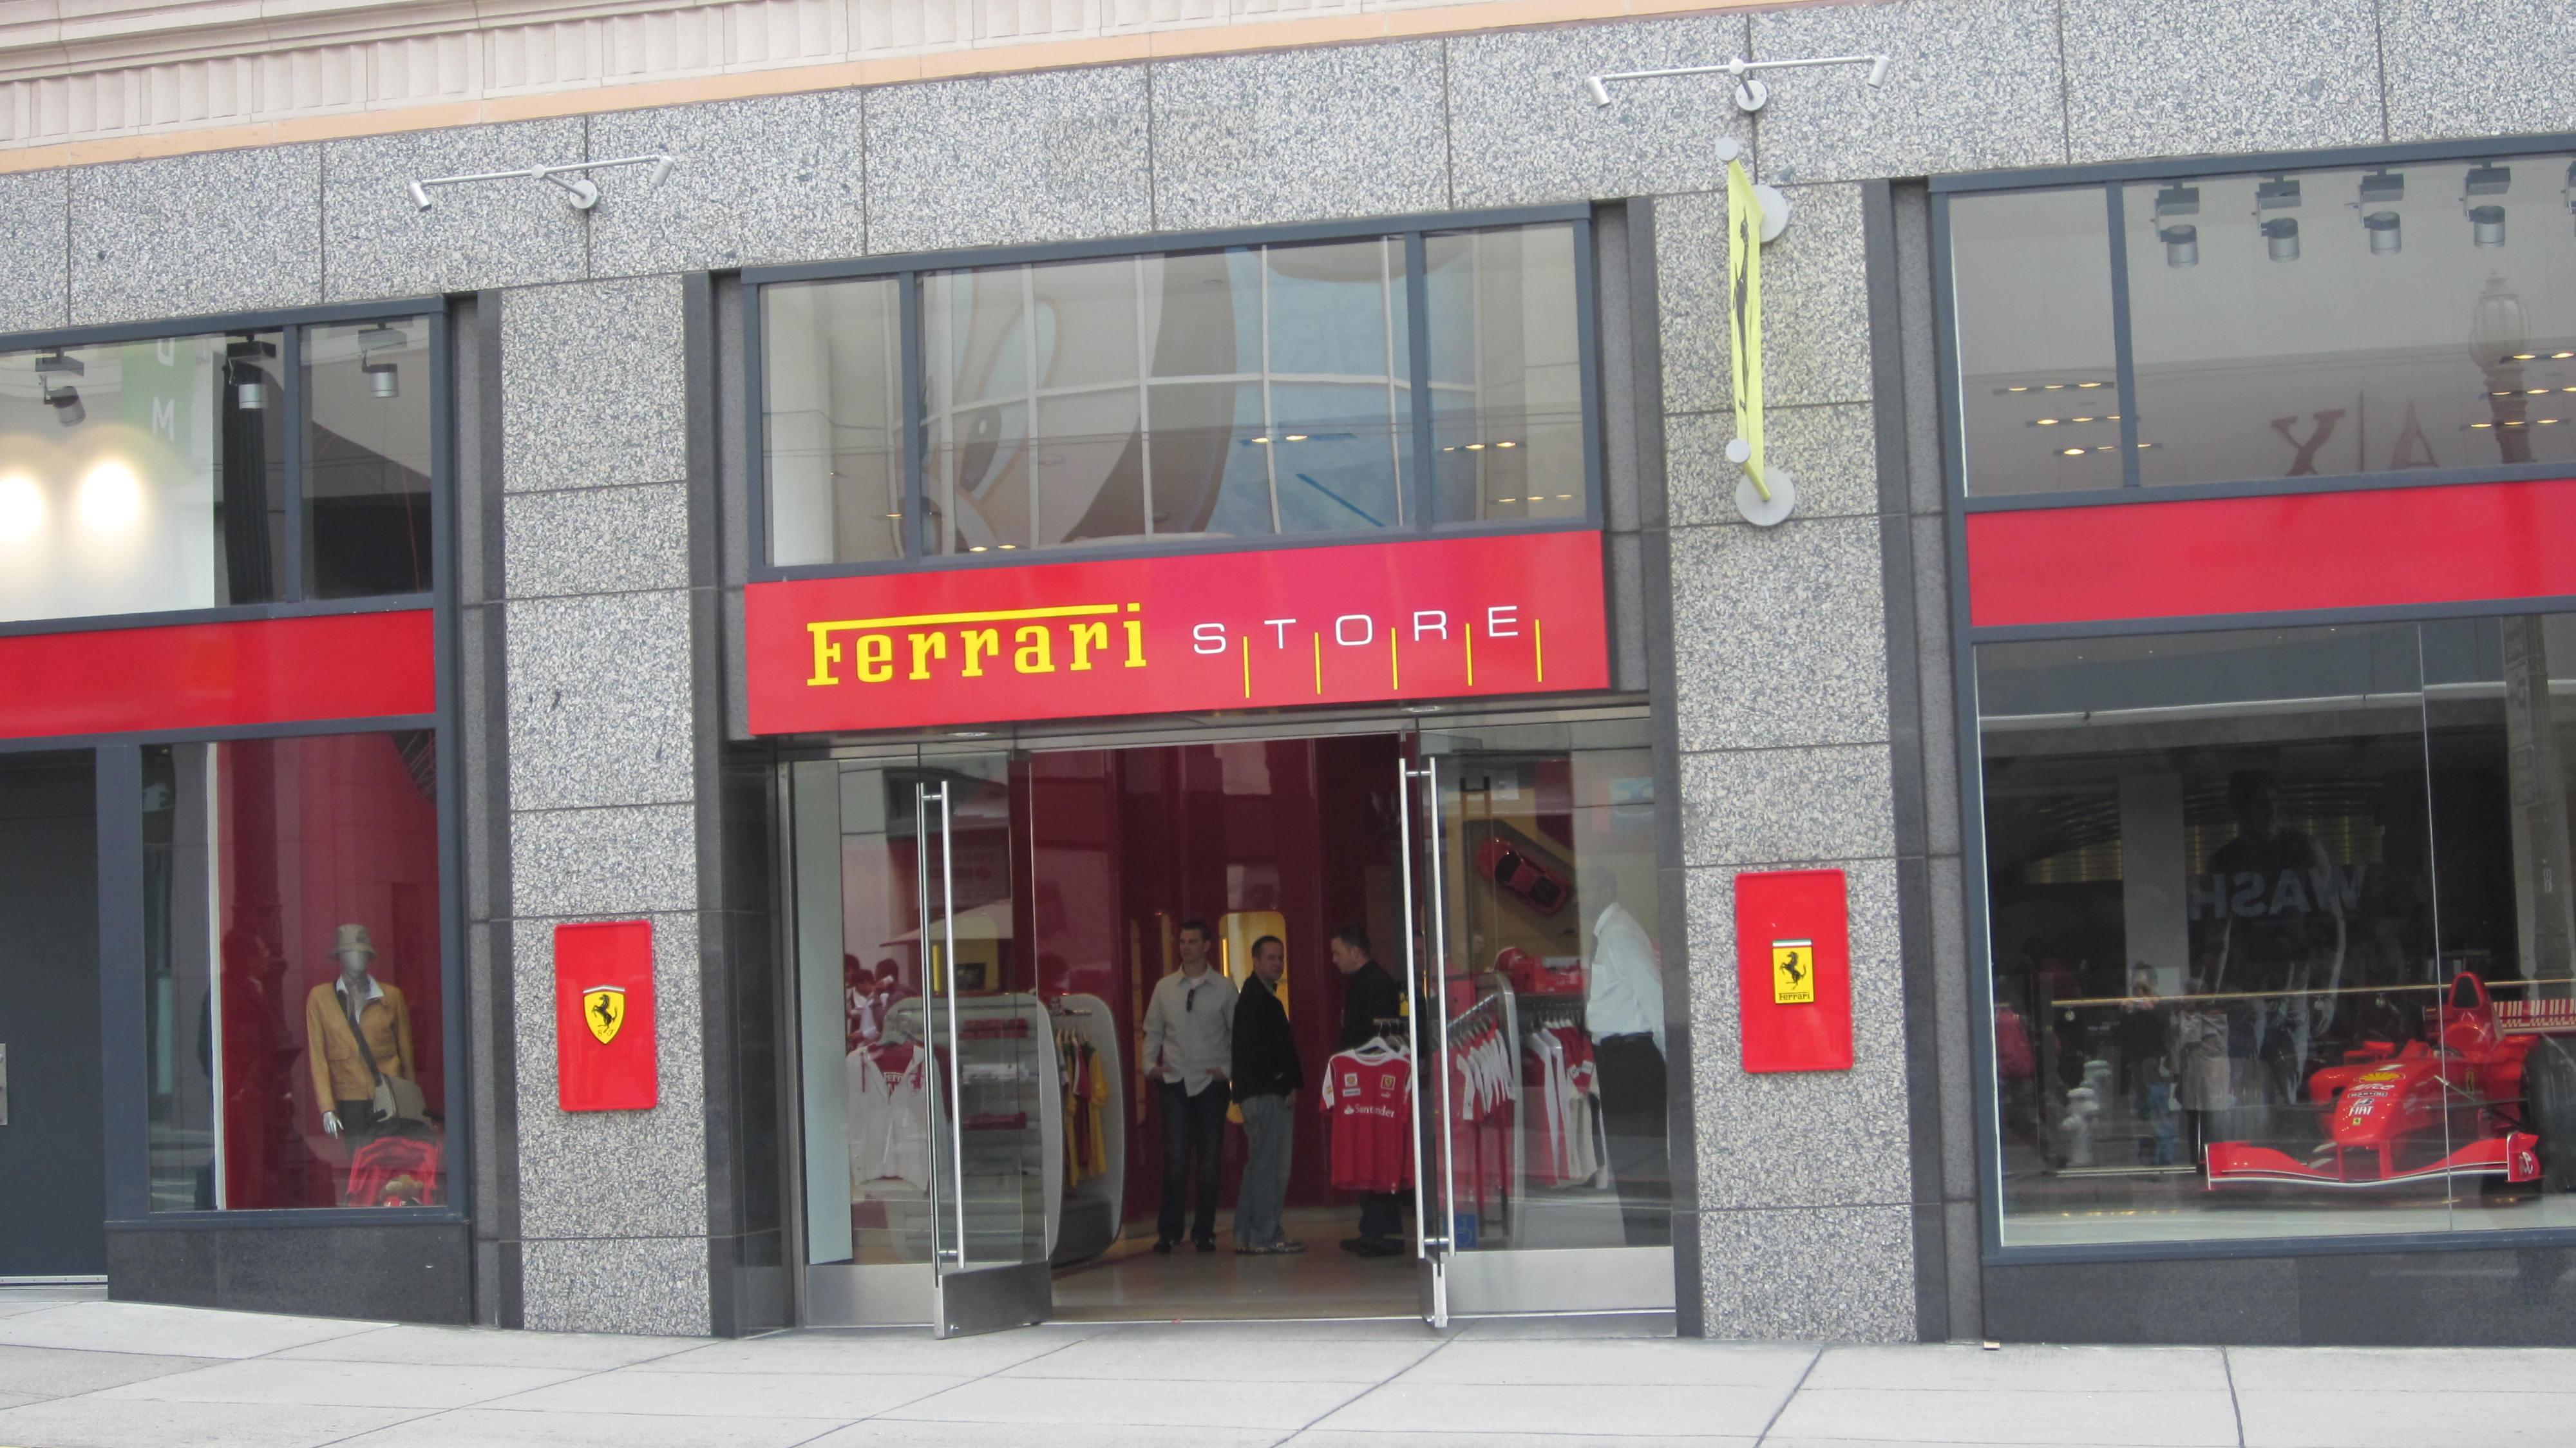 File:Ferrari Store SF exterior 1.JPG - Wikimedia Commons